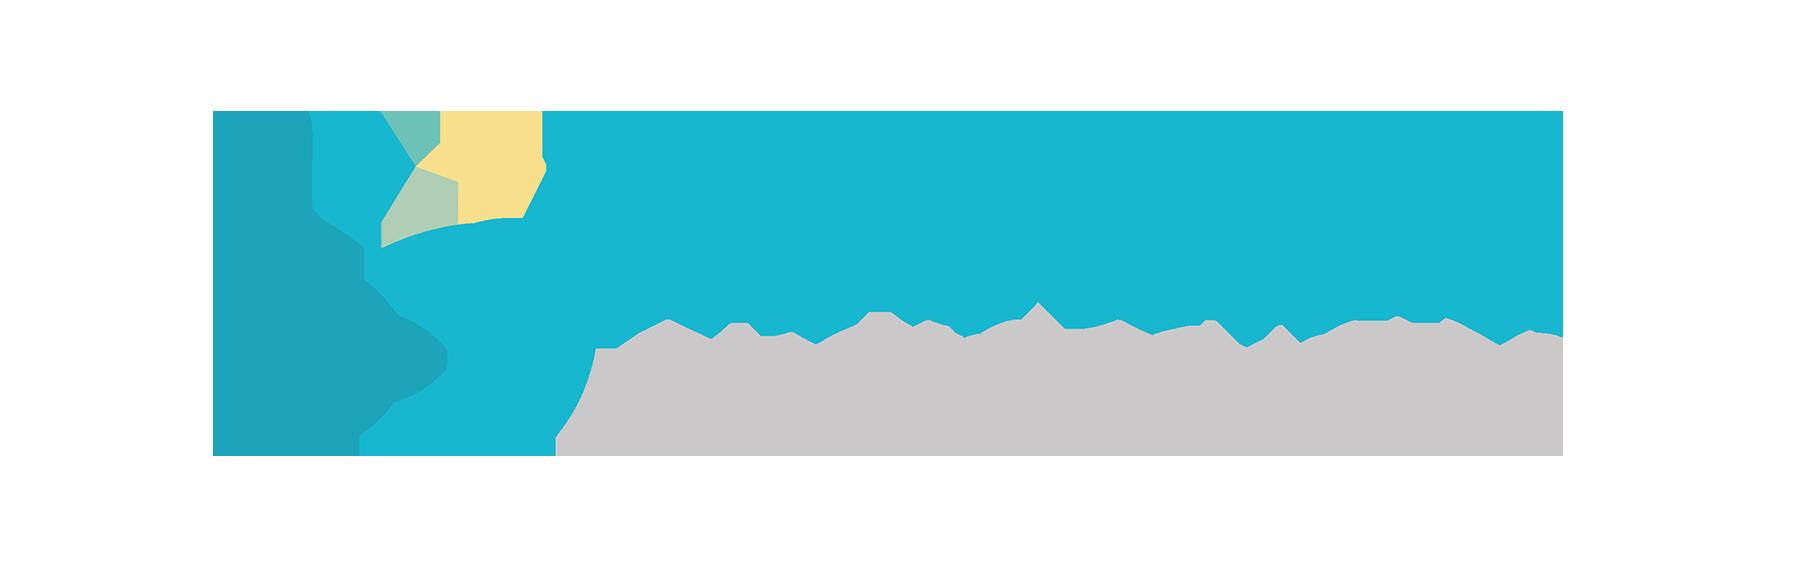 Bea Oliva